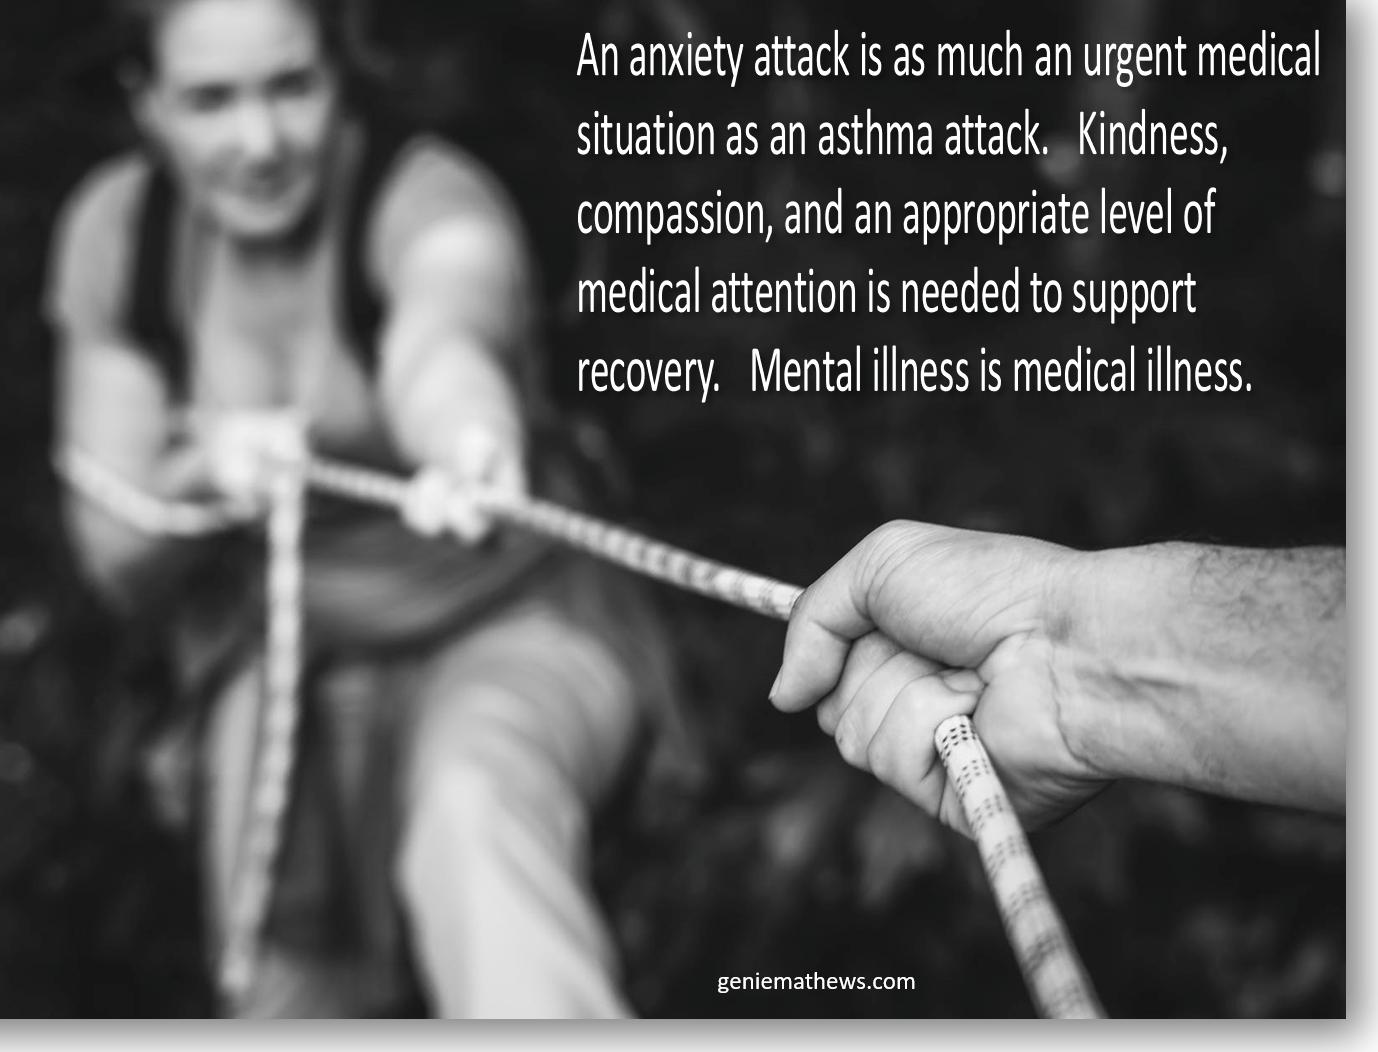 mental illness is medical illness.png